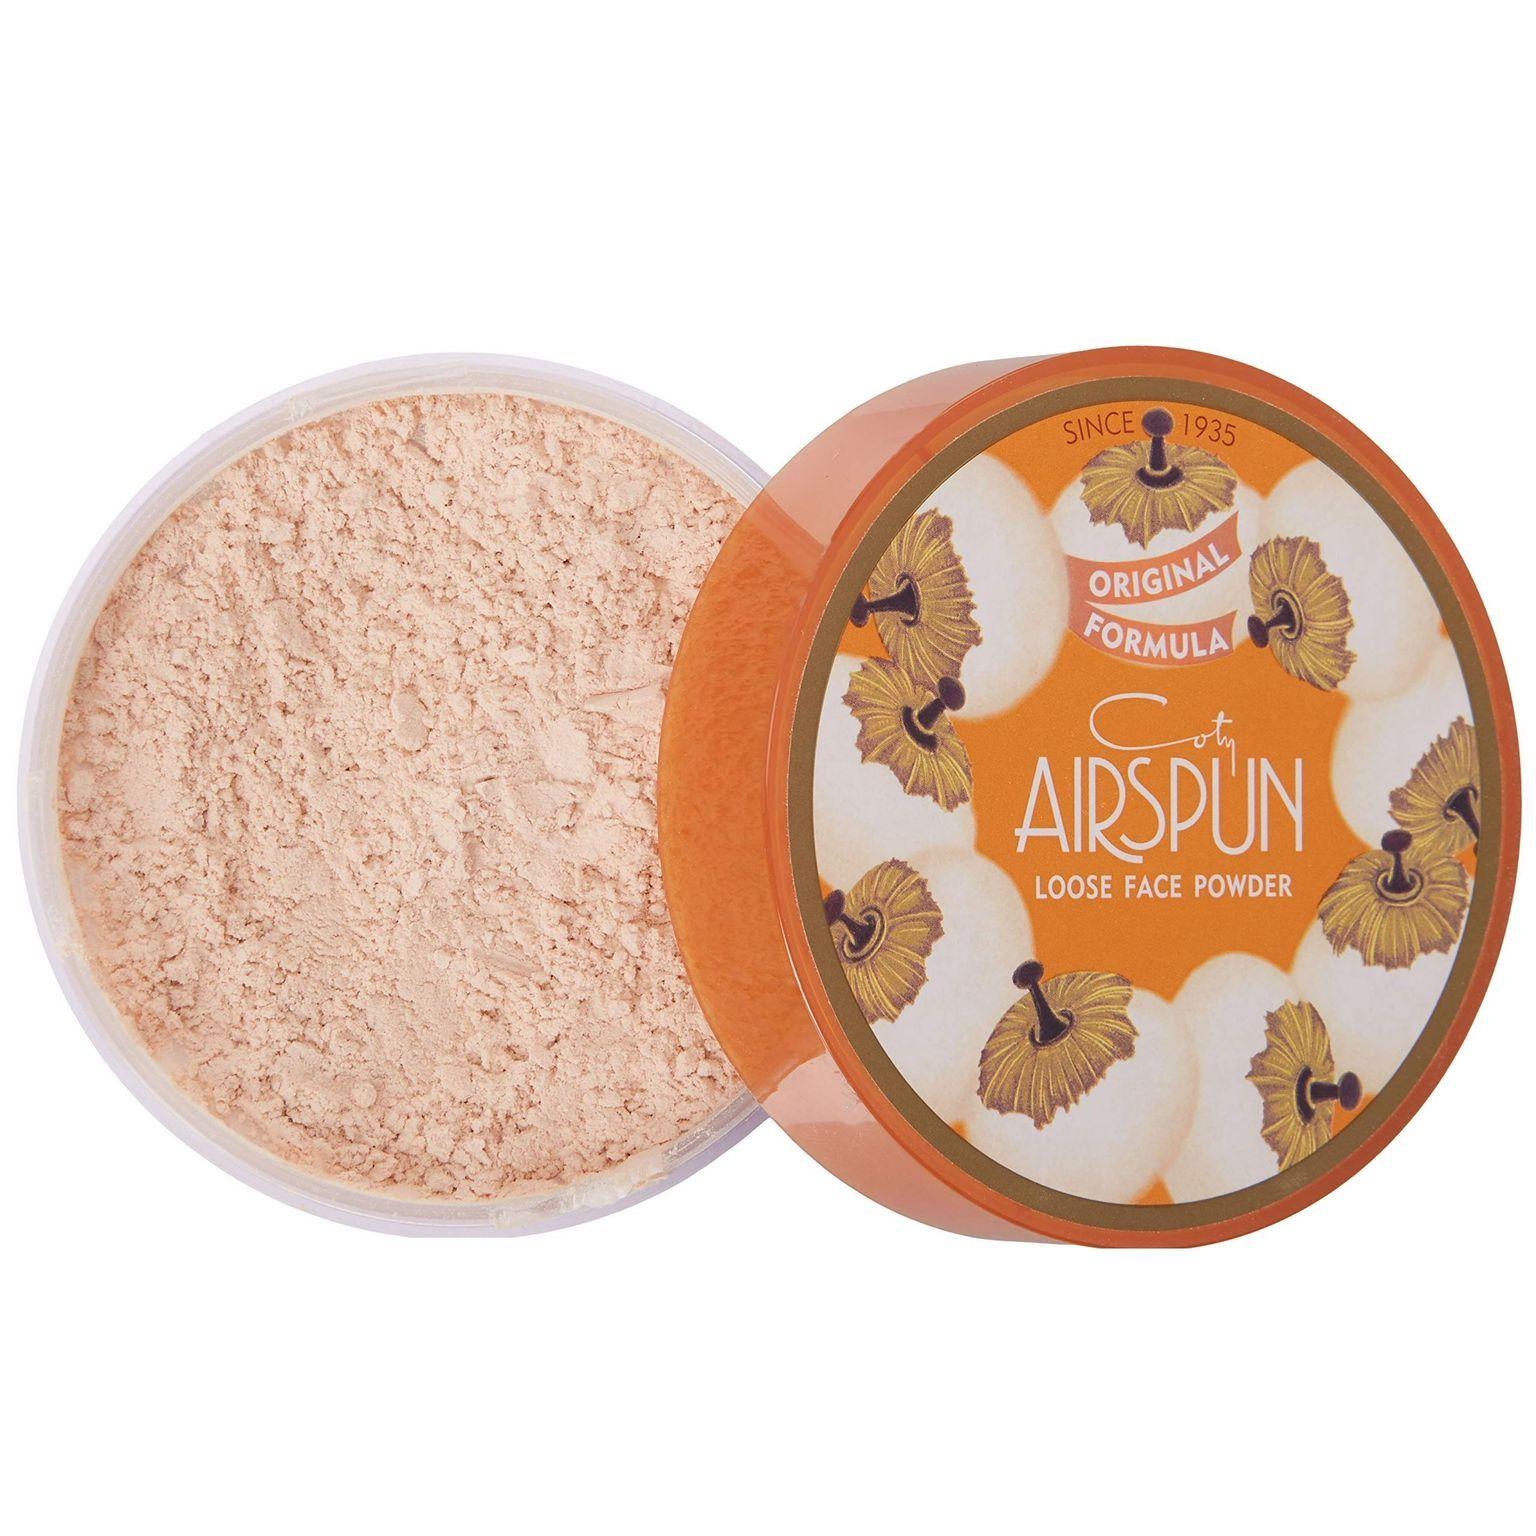 Pó Translúcido Loose Face Powder 65g - Airspun